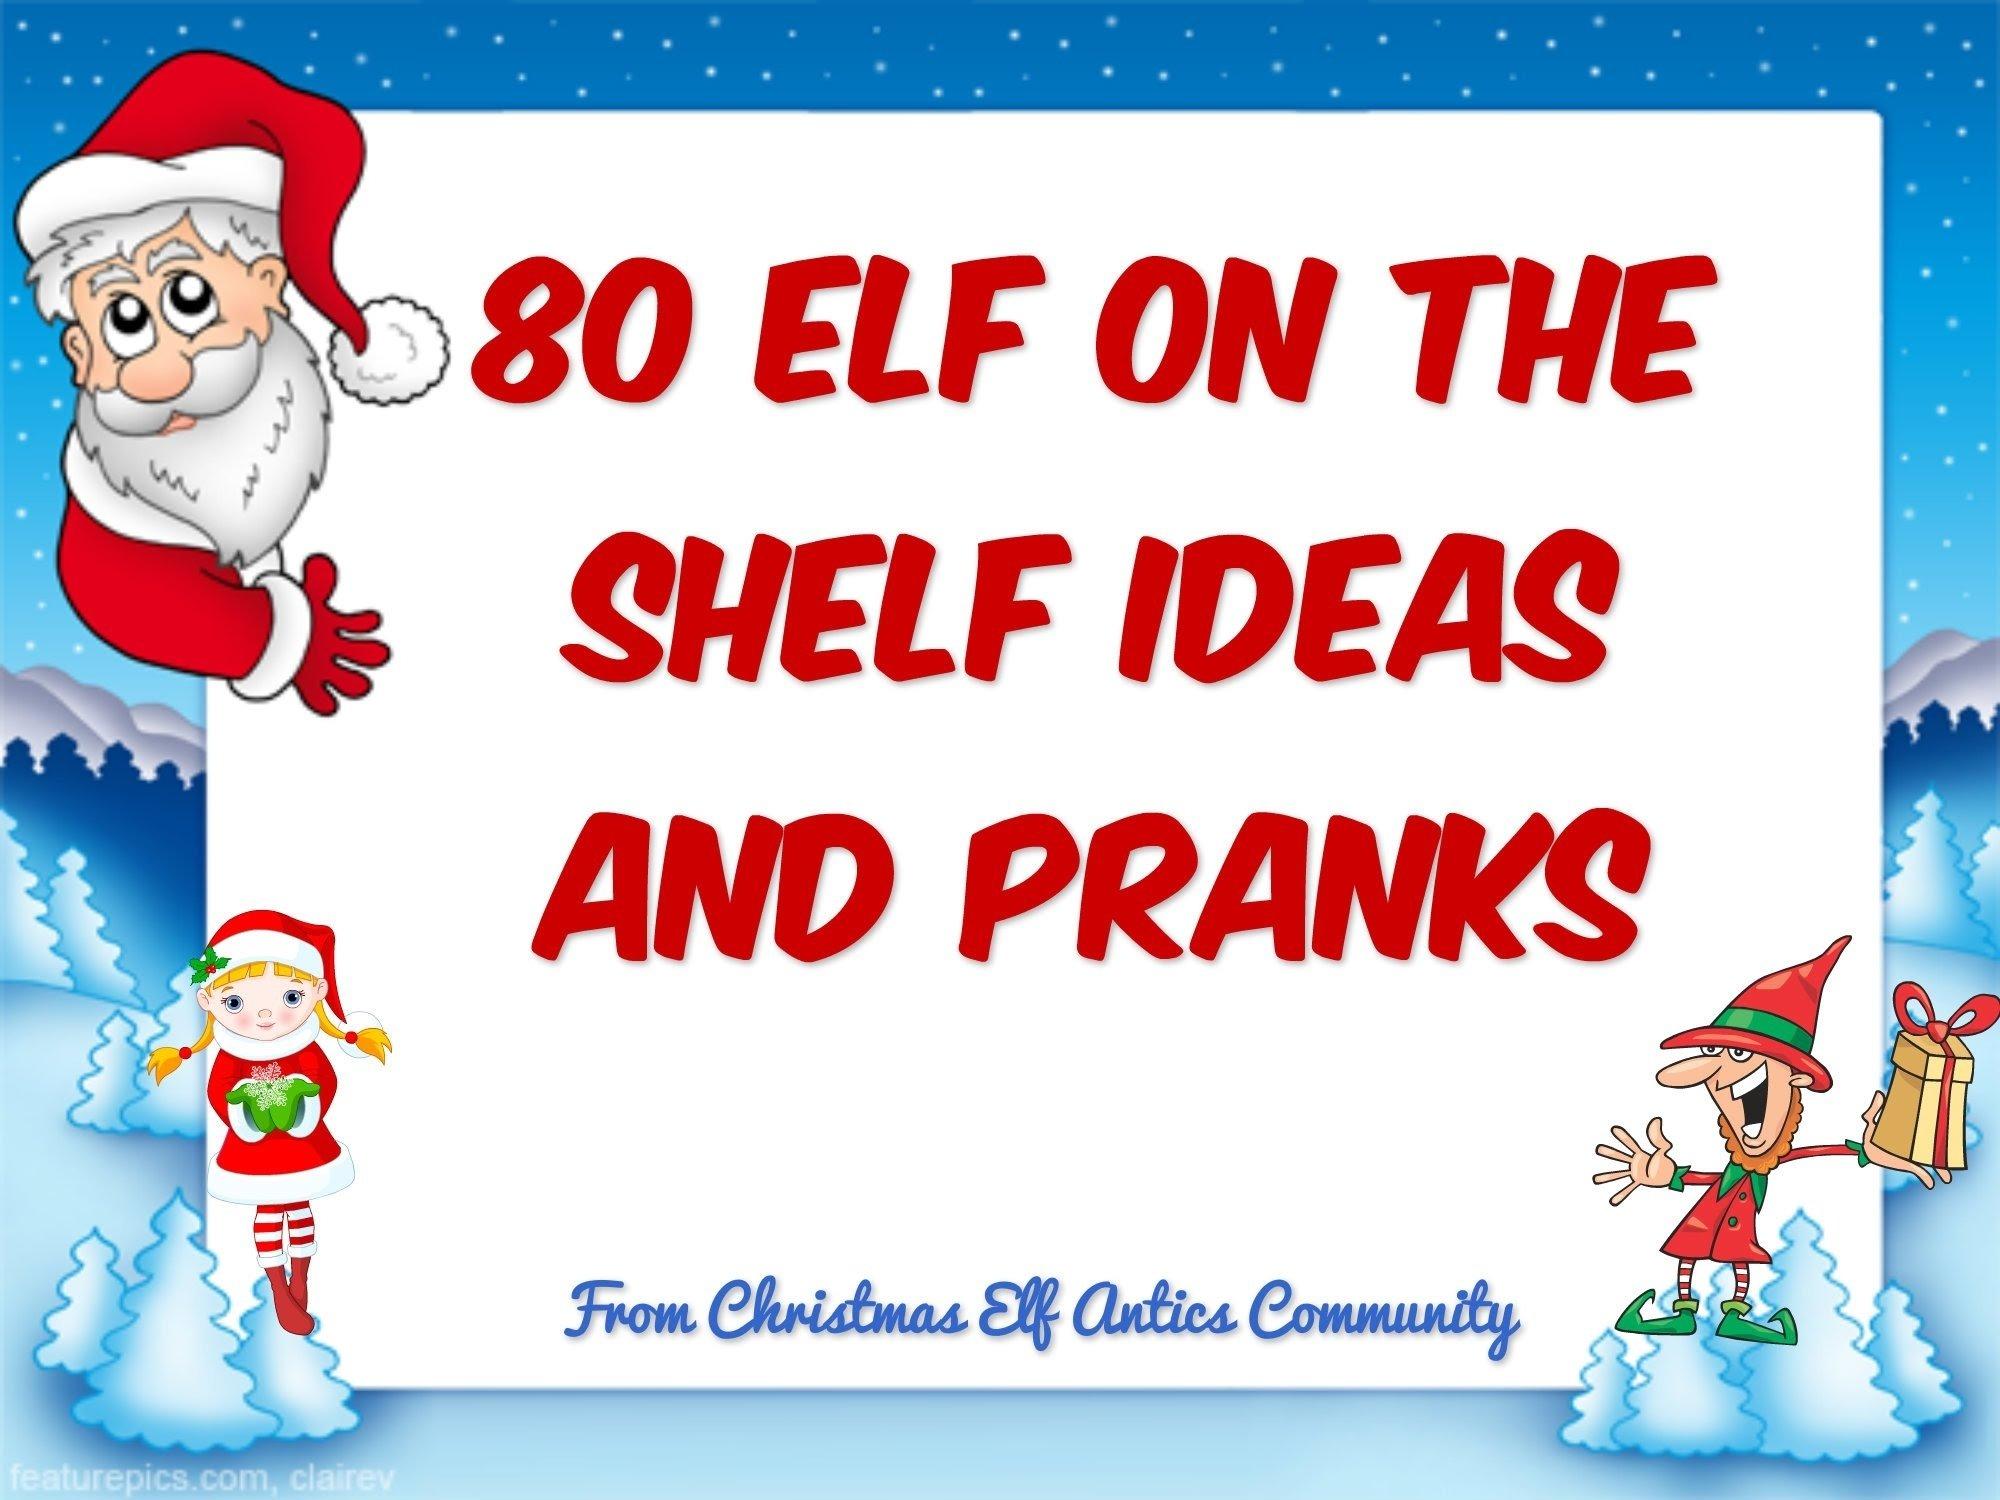 10 Most Popular Ideas For Elf On The Shelf Pranks 80 elf on the shelf ideas pictures and pranks elf on the shelf 2020